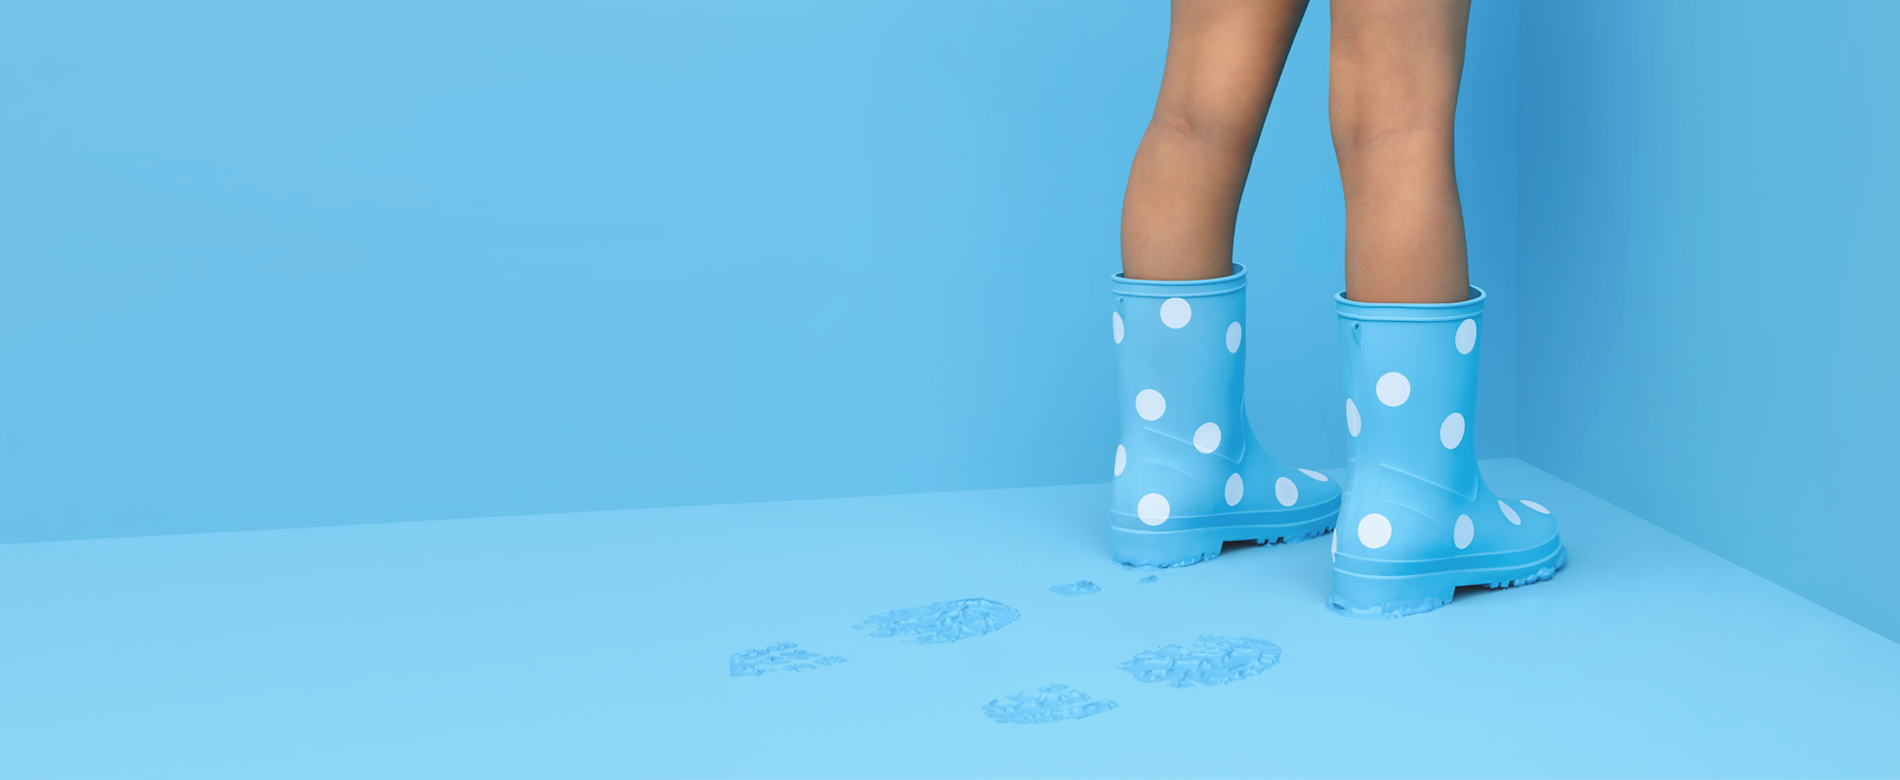 Child light blue legs